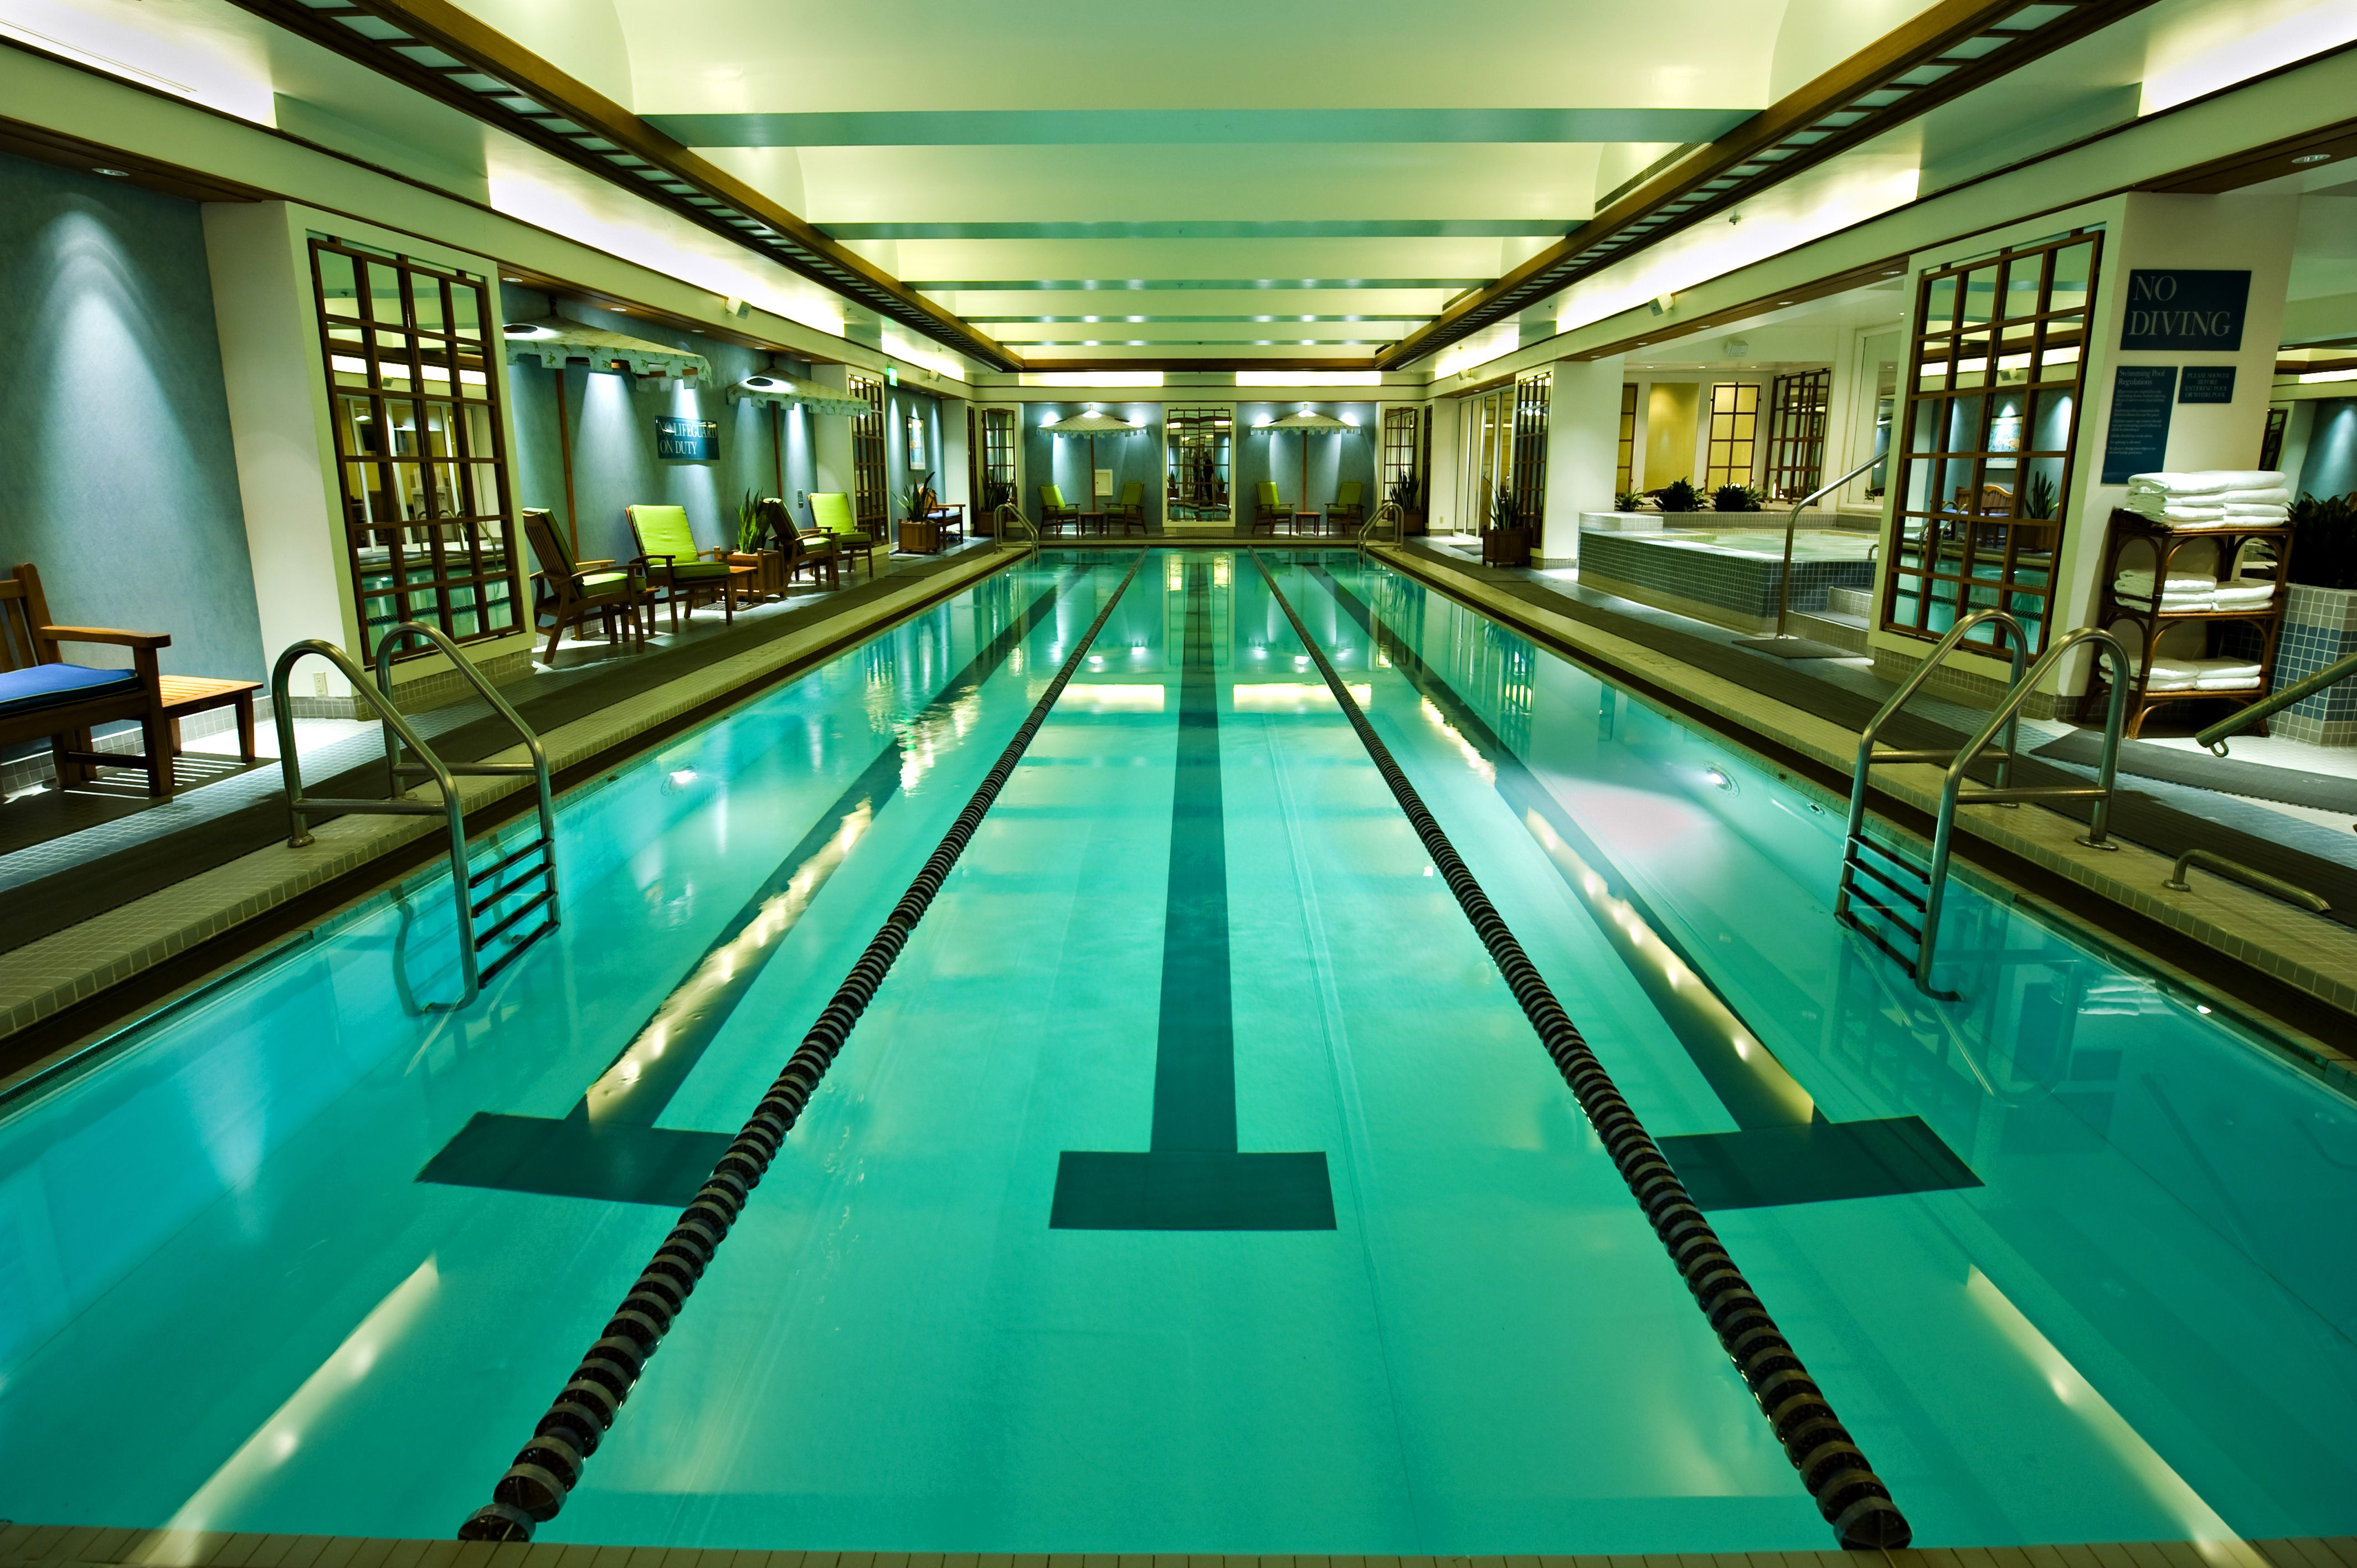 Boston Indoor Pool Http Www Bhh Com Spa Boston Hotels Luxury Pools Harbor Hotel